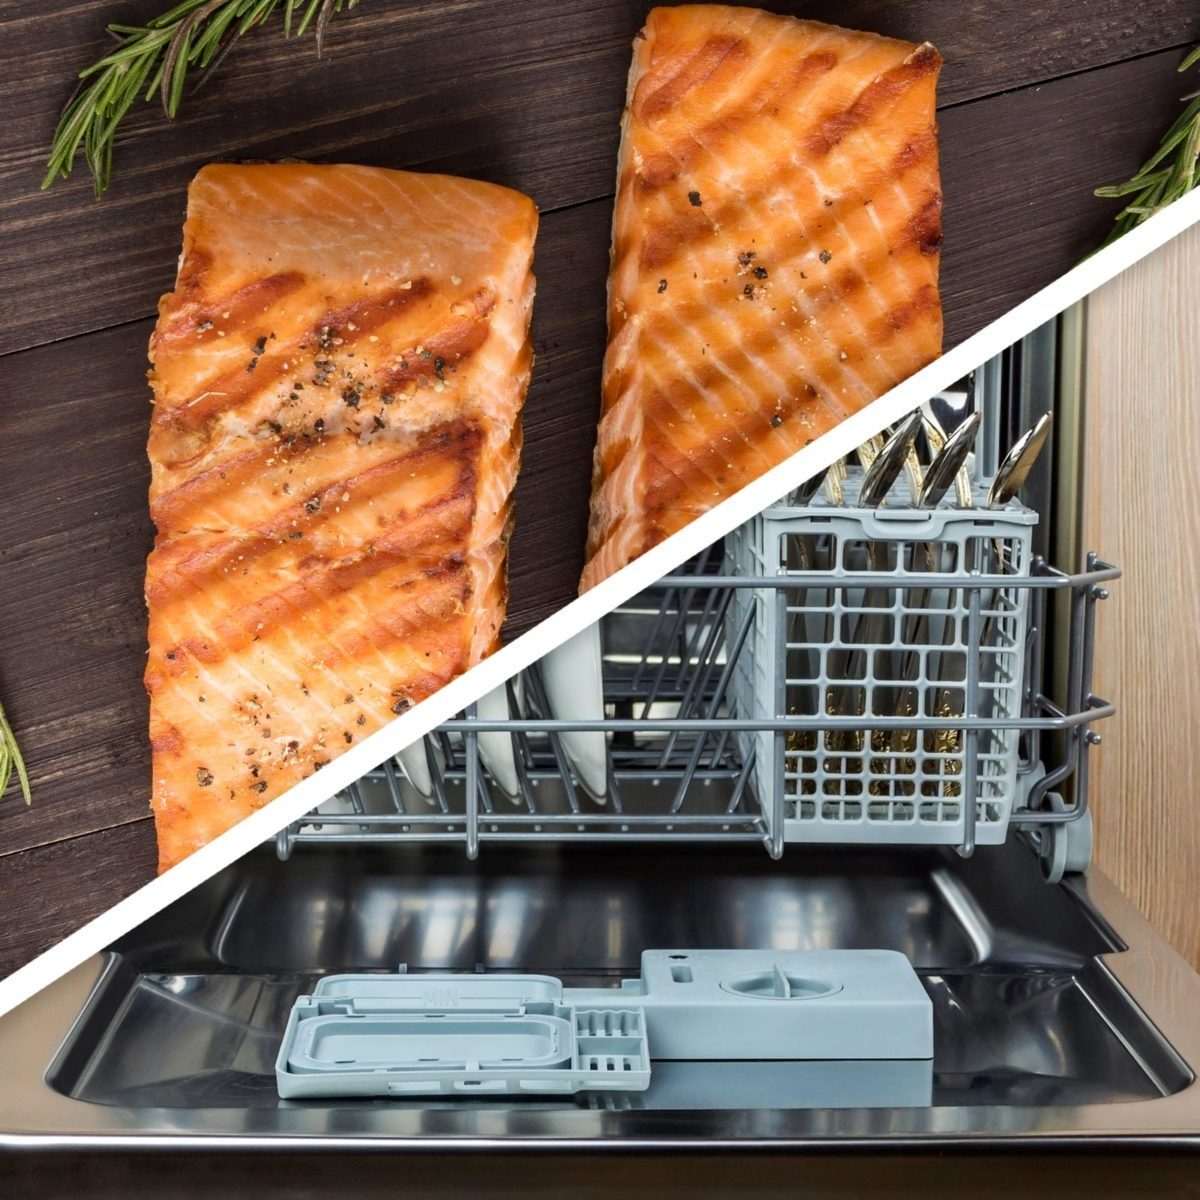 Salmon and dishwasher